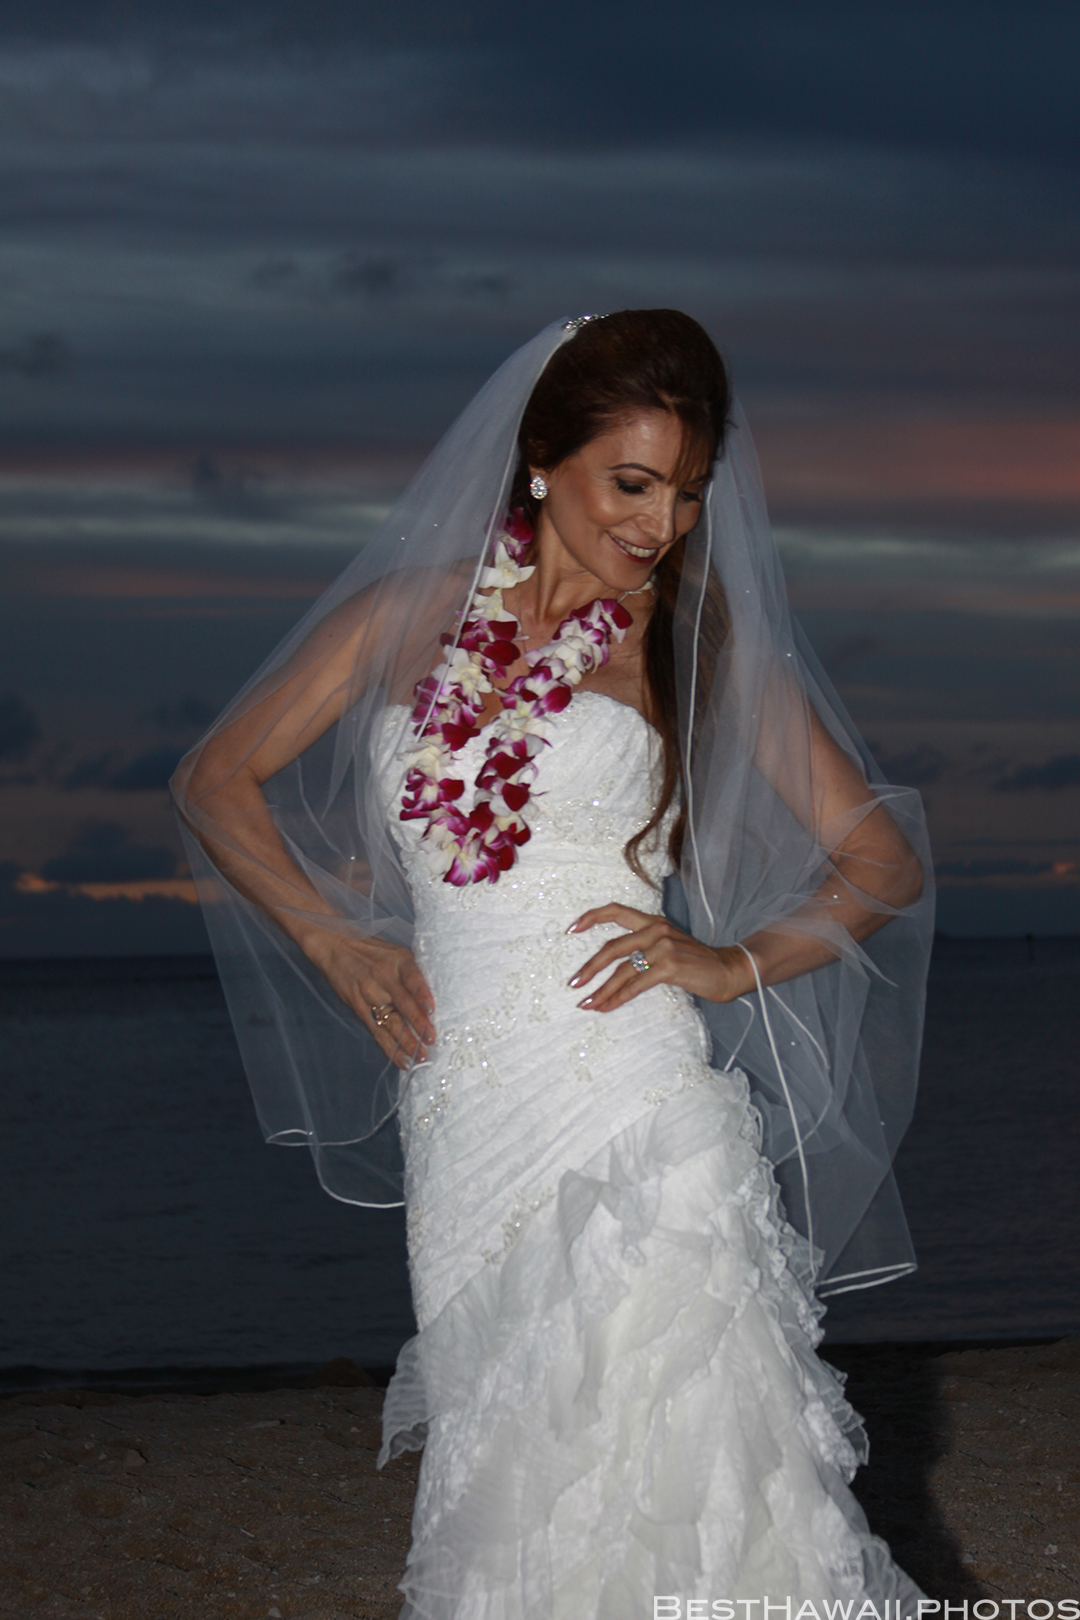 Sunset Wedding Photos in Waikiki by Pasha www.BestHawaii.photos 121820158701